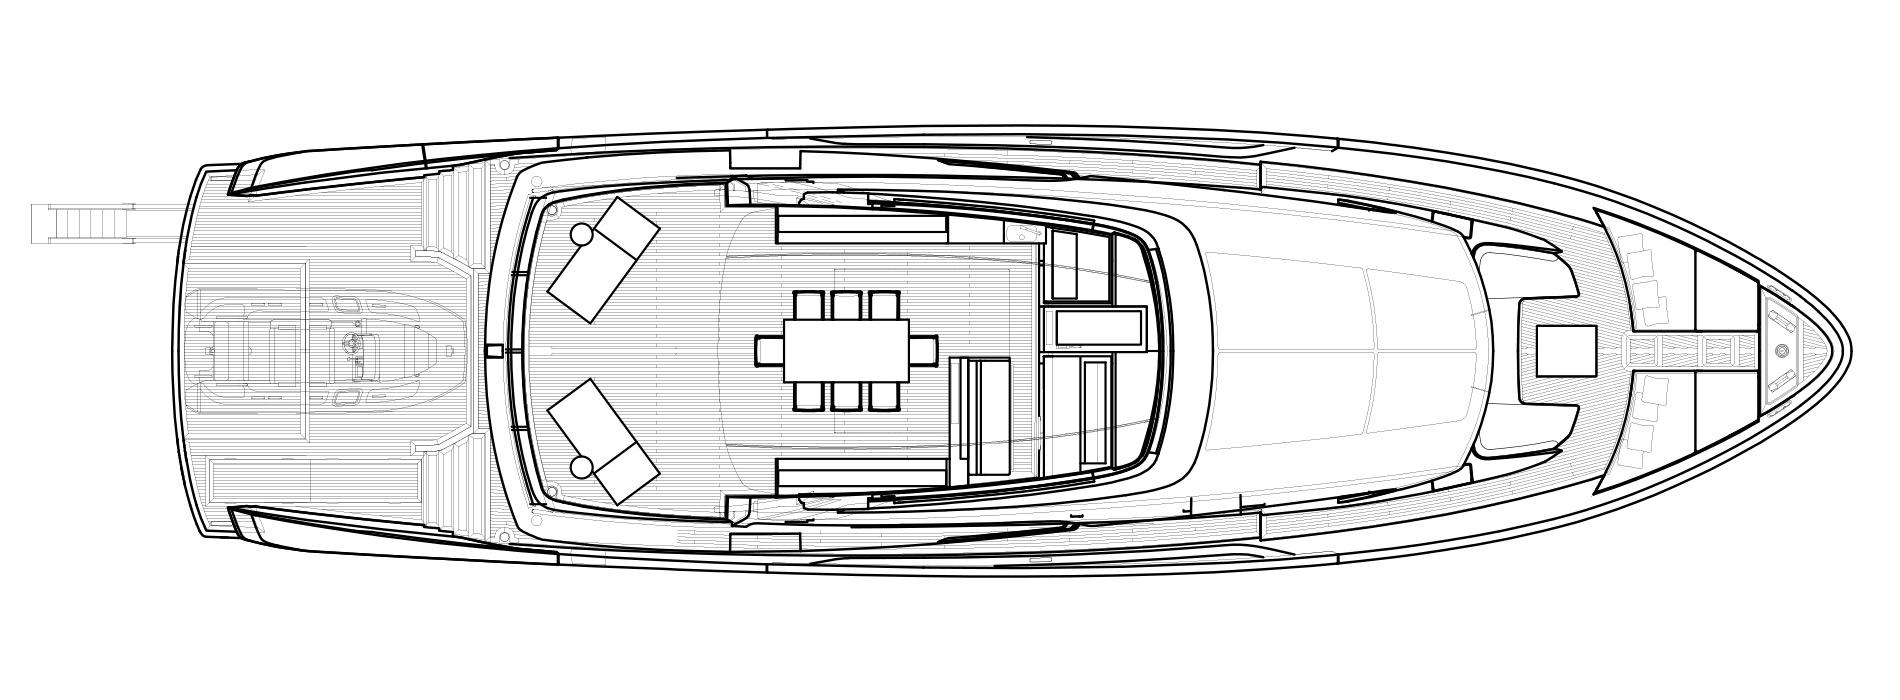 Sanlorenzo Yachts SX88 Флайбридж версия Lissoni